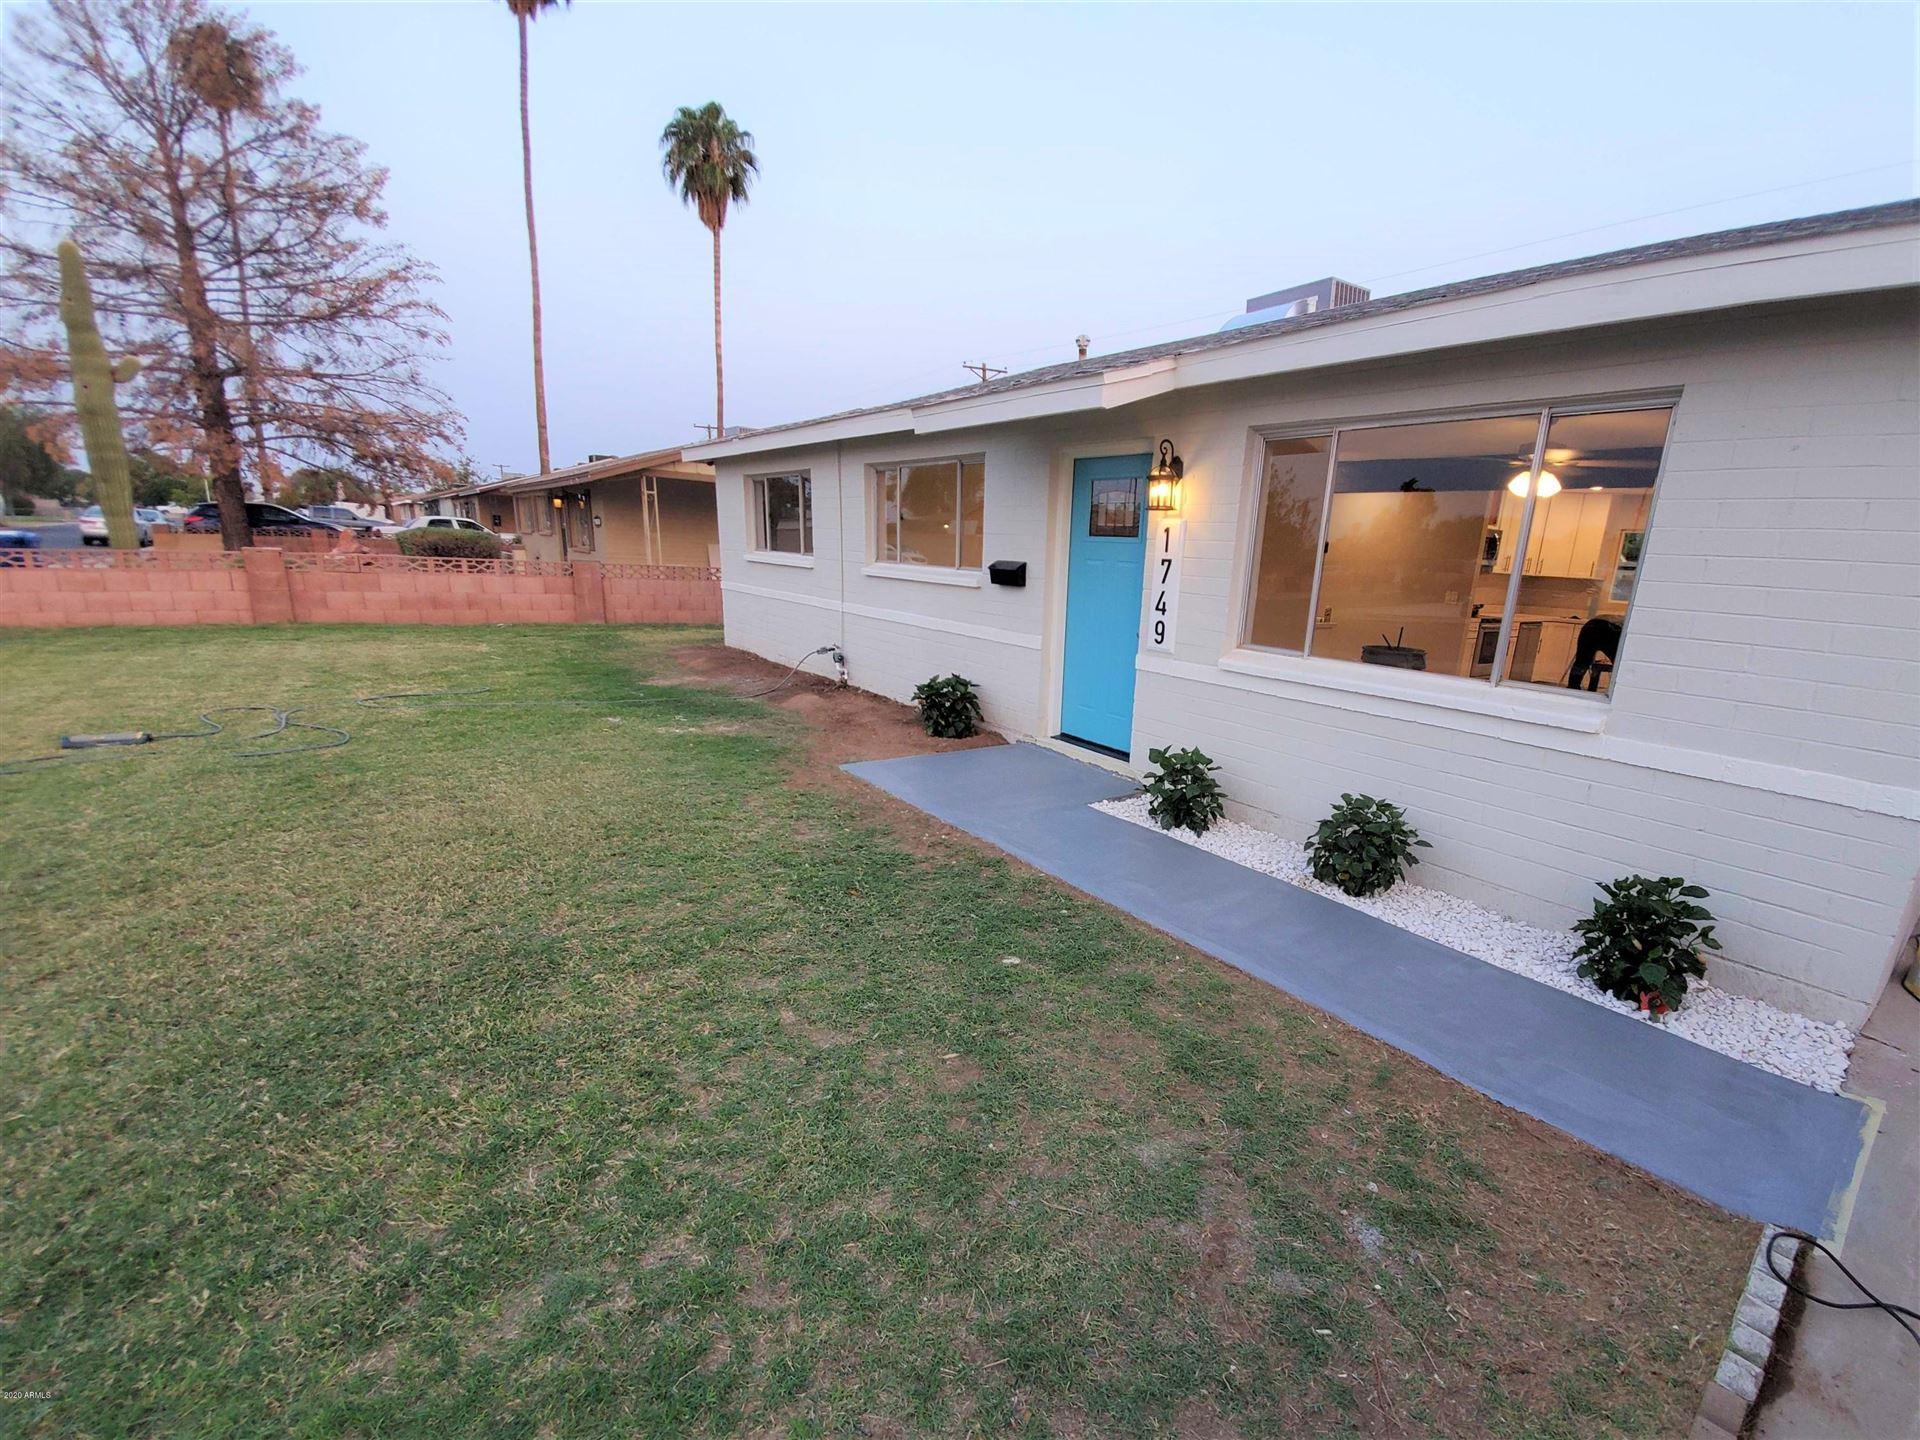 1749 W ALCOTT Street, Mesa, AZ 85201 - MLS#: 6134701